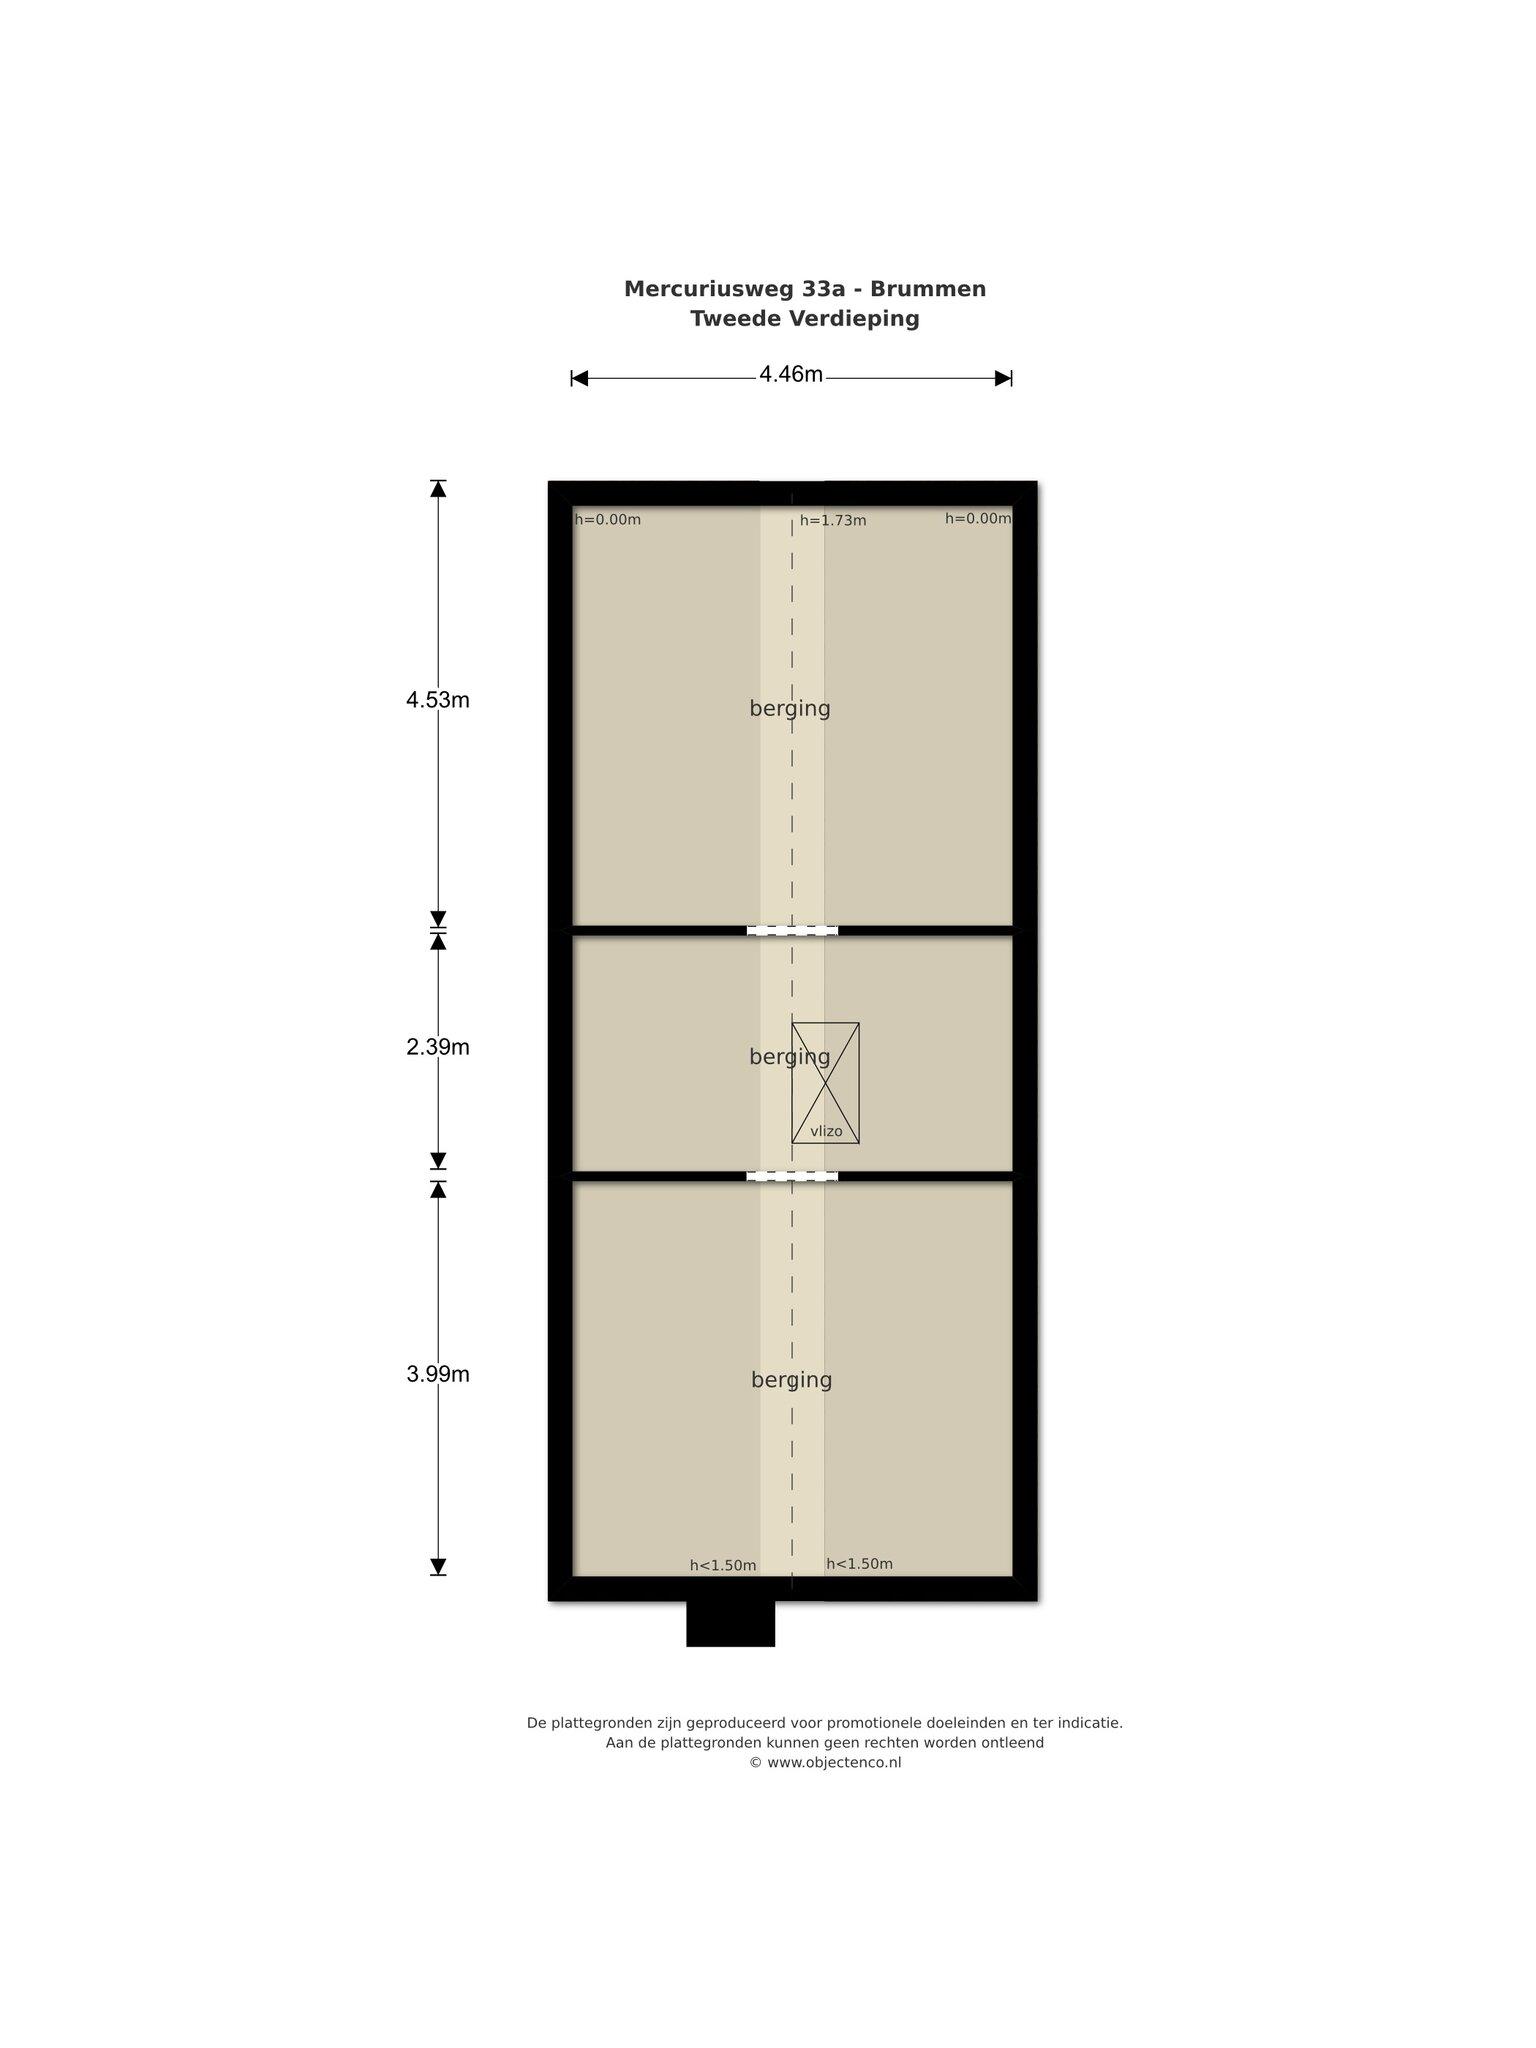 Plattegrond van Mercuriusweg 33a